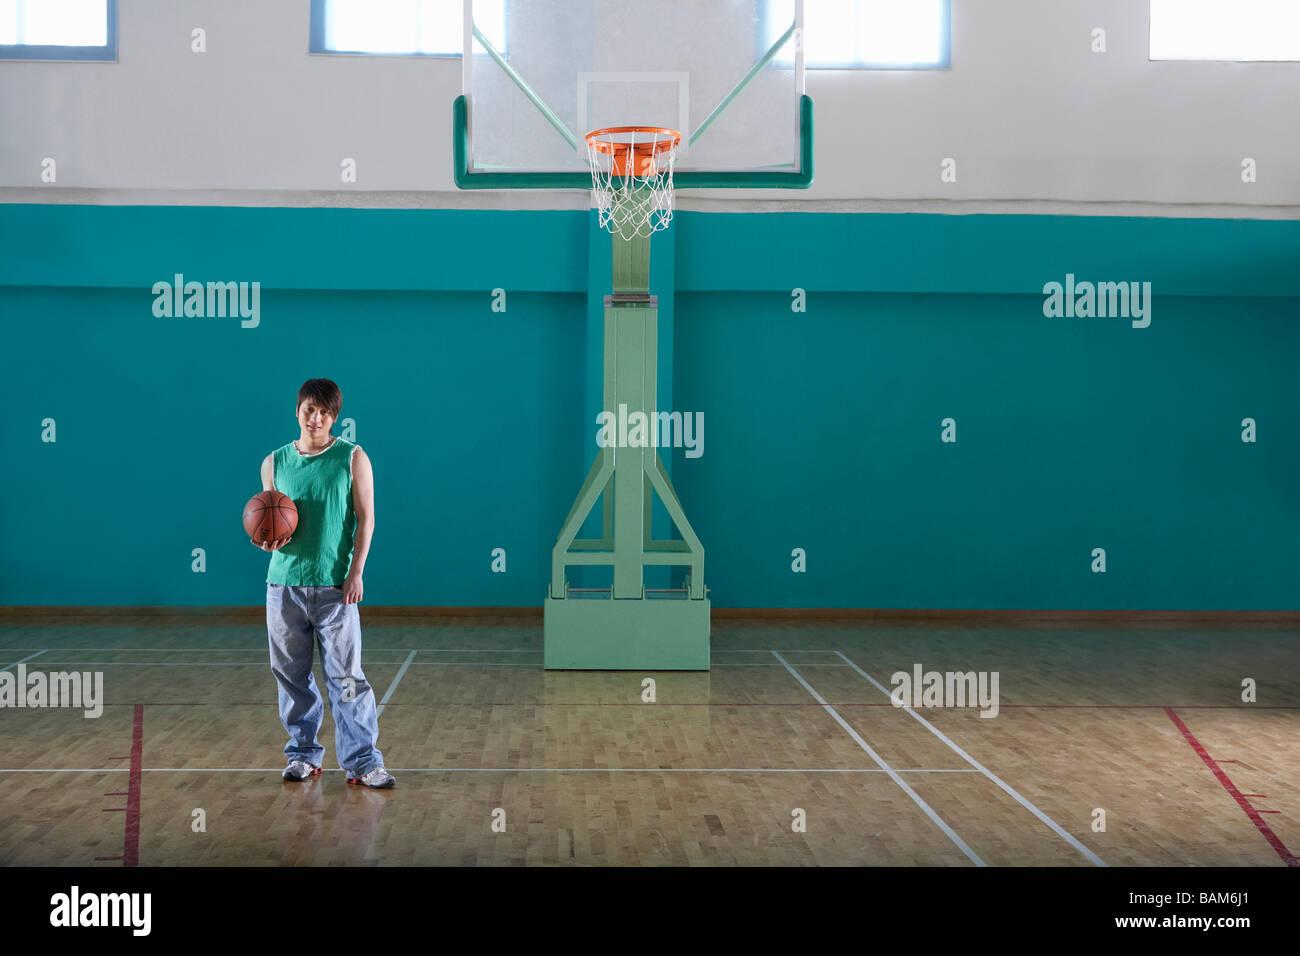 Teenage Boy Holding Basketball - Stock Image